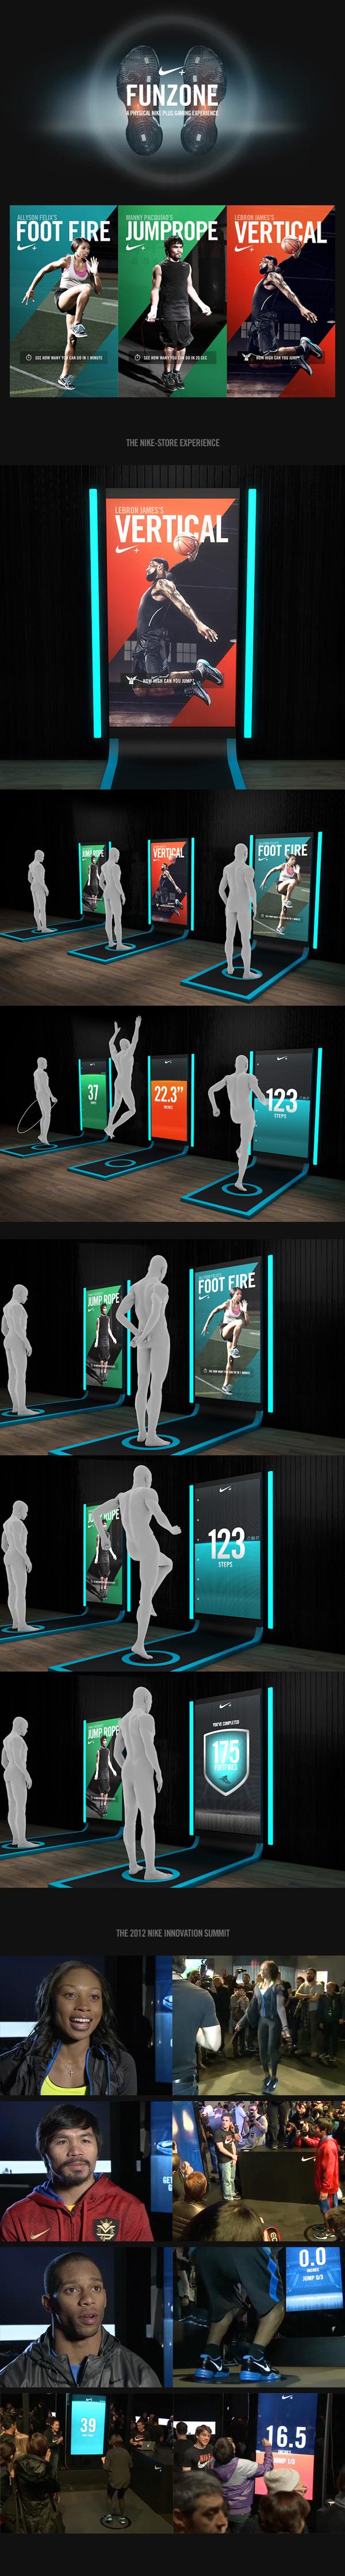 Nike+ FunZone on Behance #http #wwwworkitkittycom